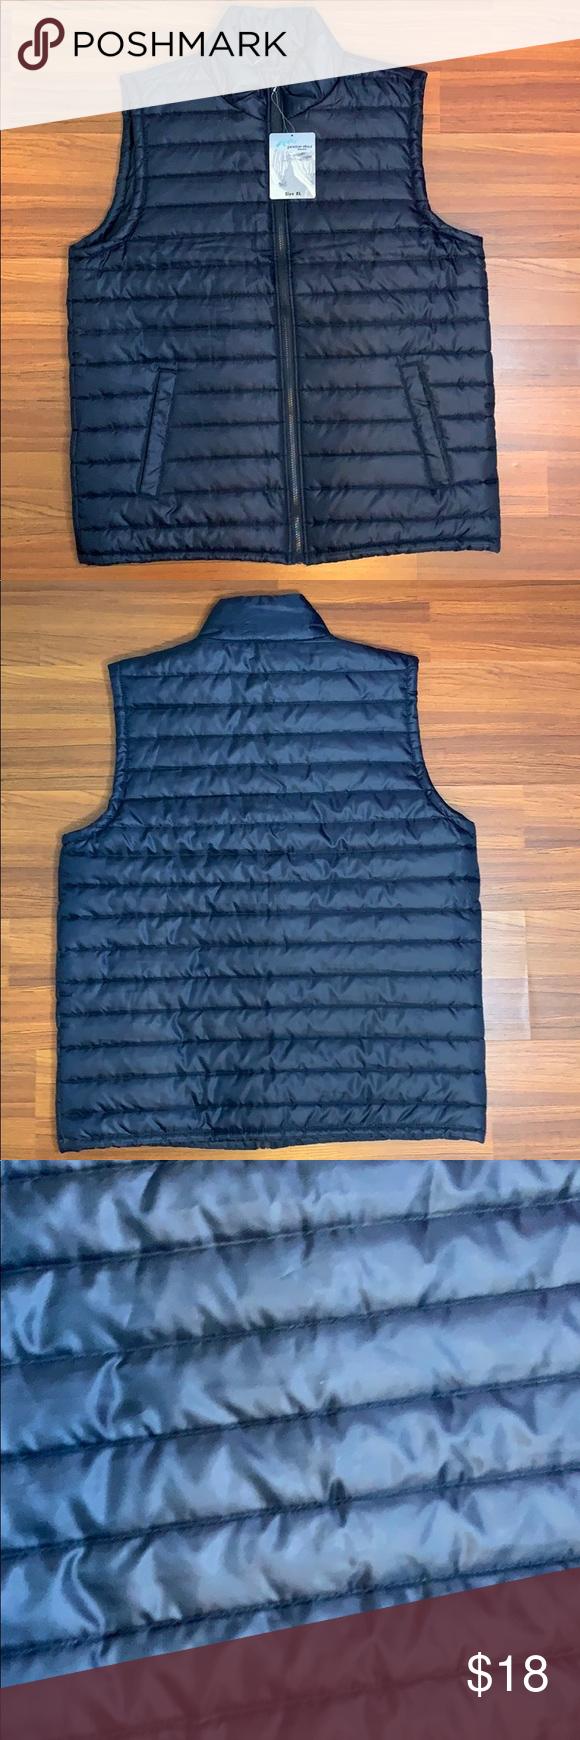 Nwt Jackson Hole Puffer Vest Clothes Design Jackson Hole Fashion [ 1740 x 580 Pixel ]